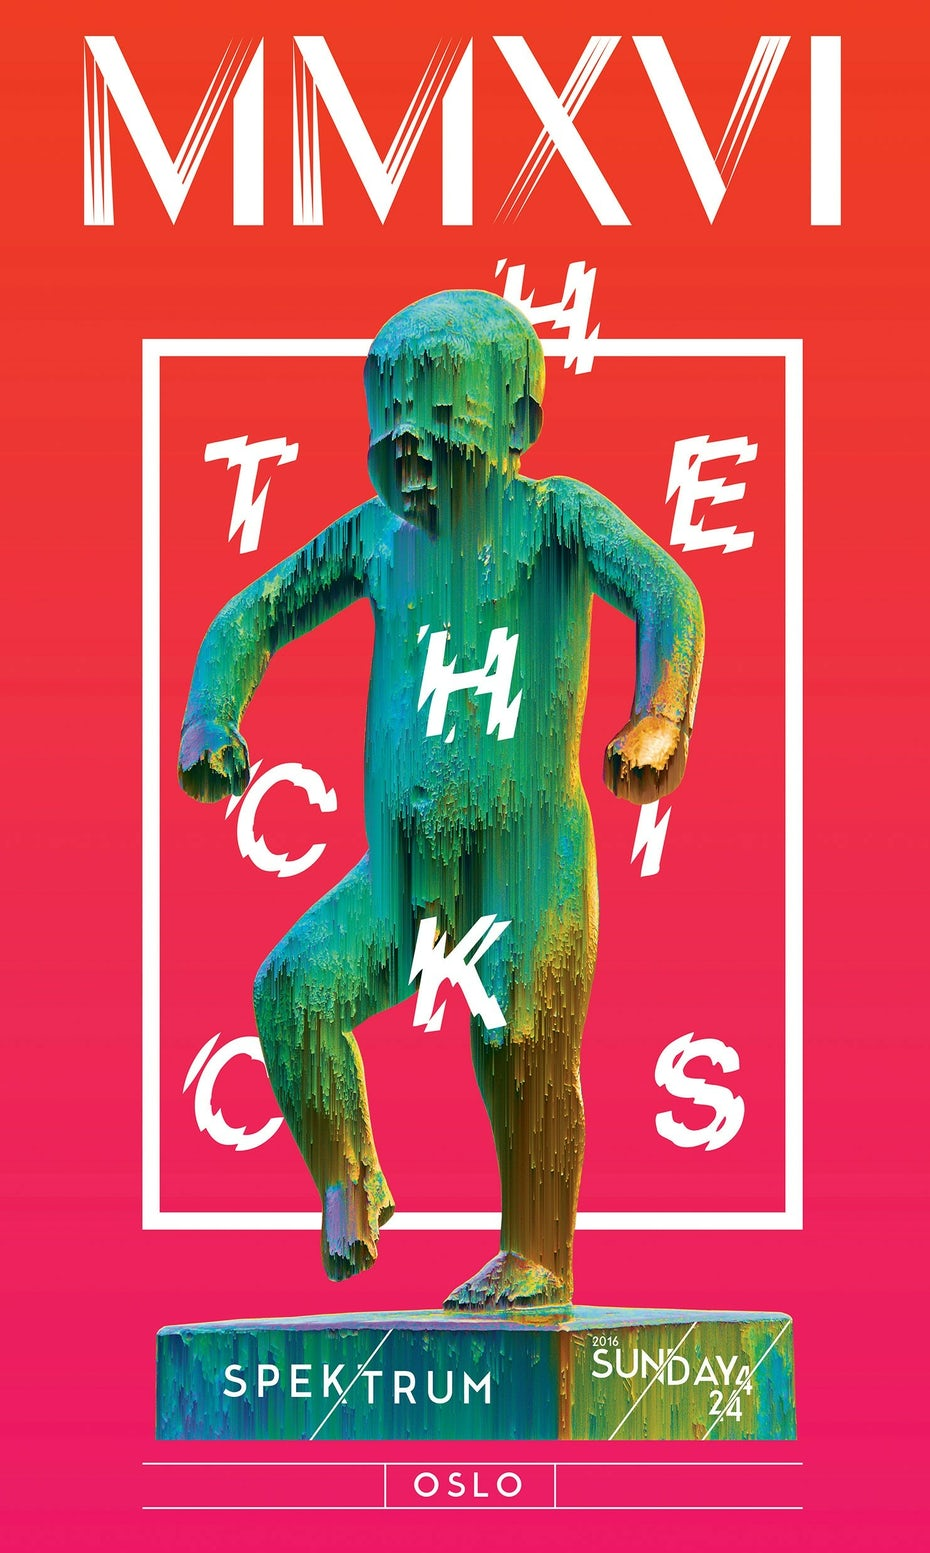 Glitch art Dixie Chicks event marketing material